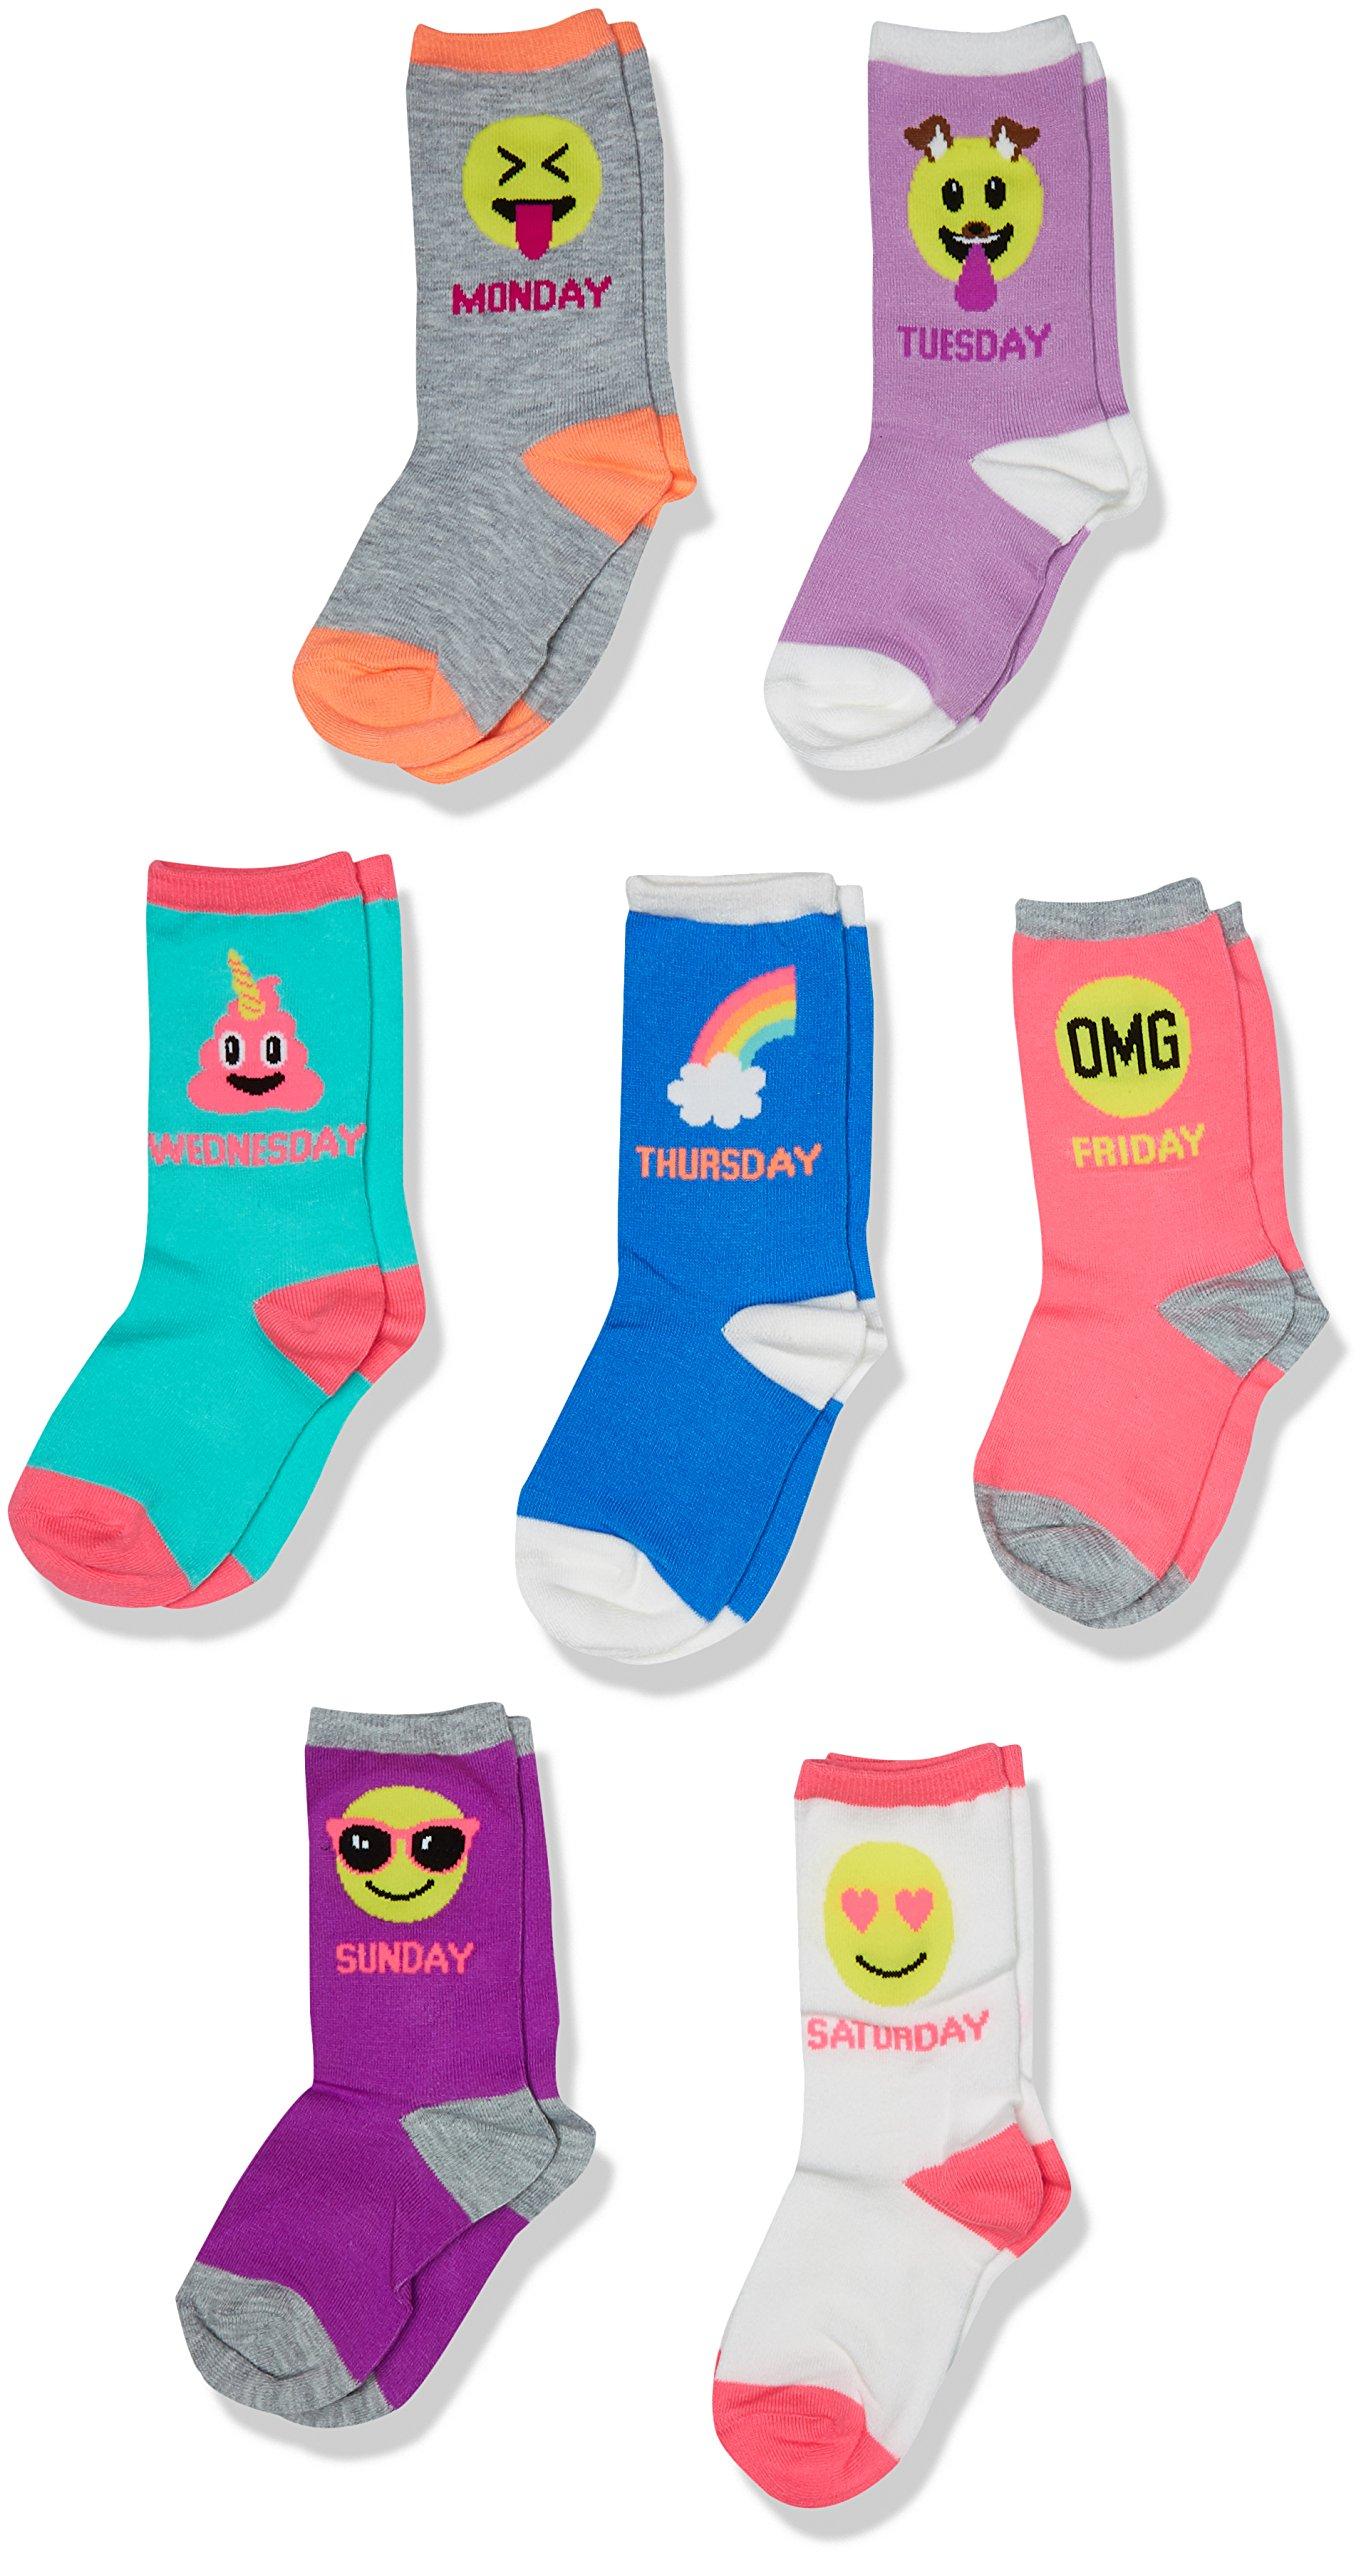 The Children's Place Toddler Girls' Crew Socks (Pack of 7), Multi, L 3-6